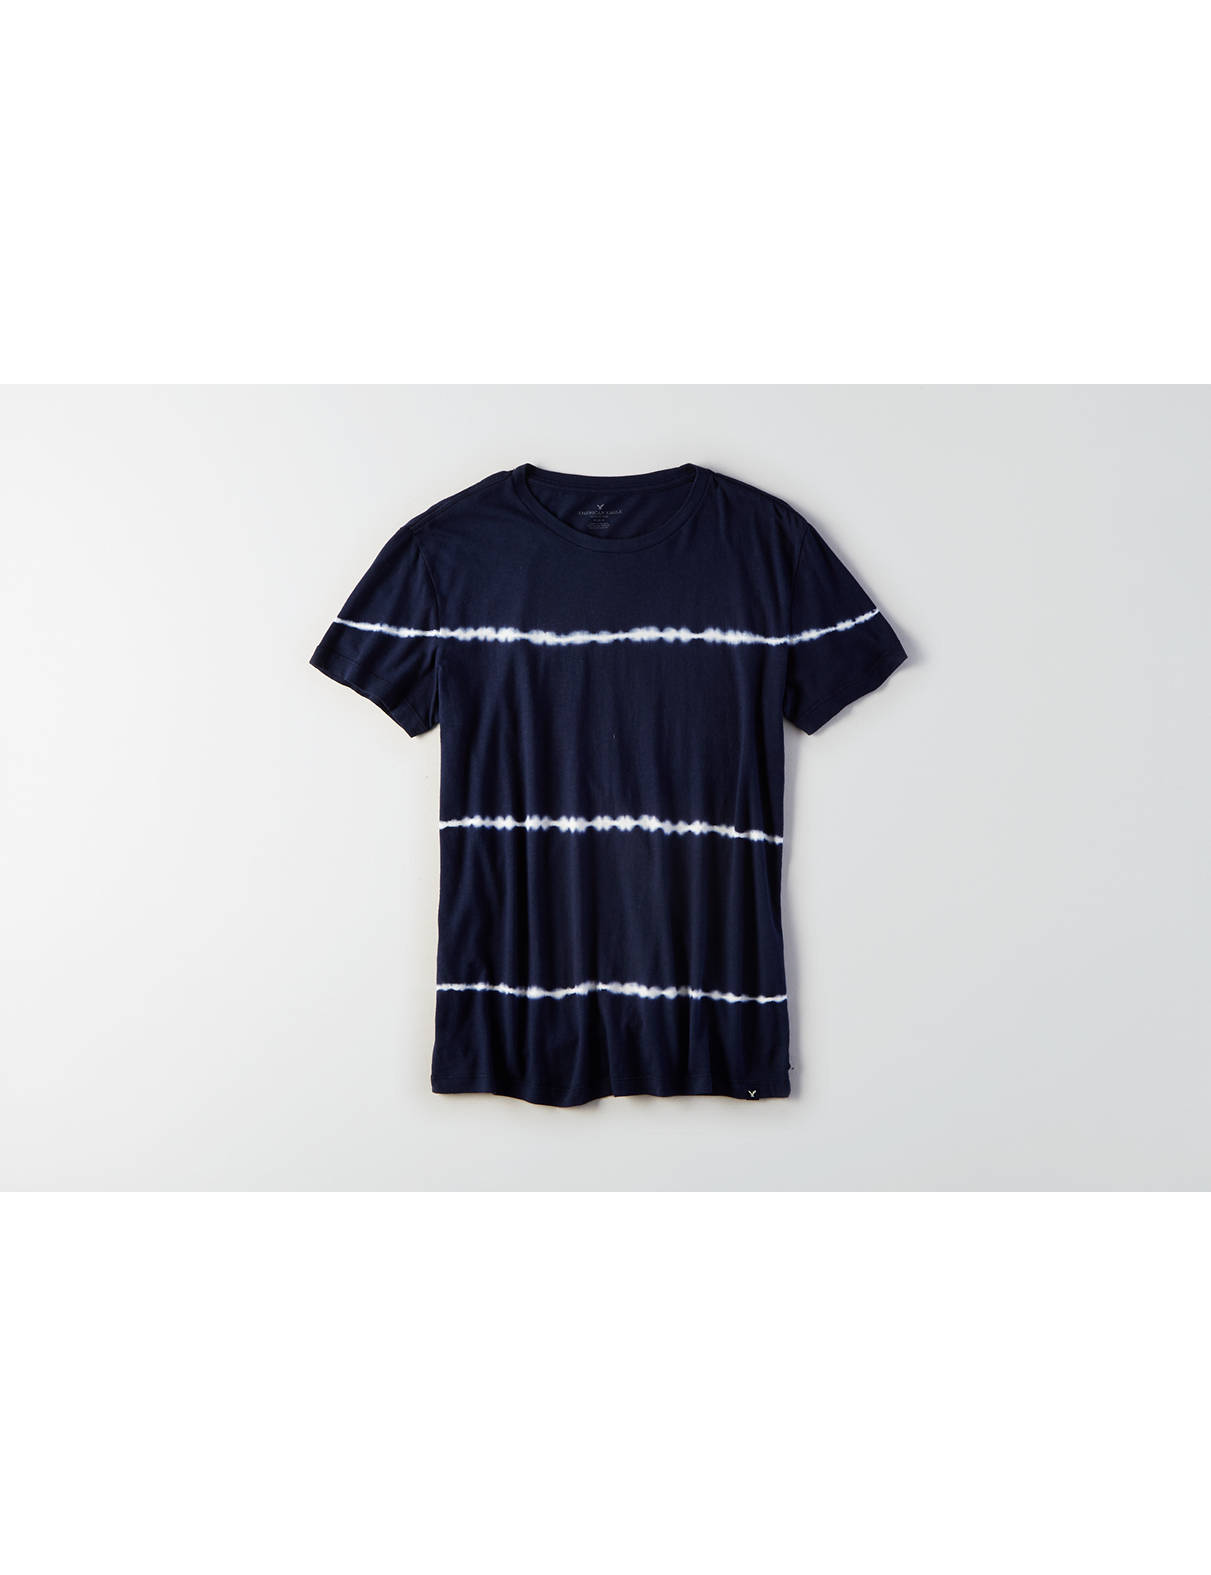 Design t shirt online canada - Design T Shirt Online Canada 15